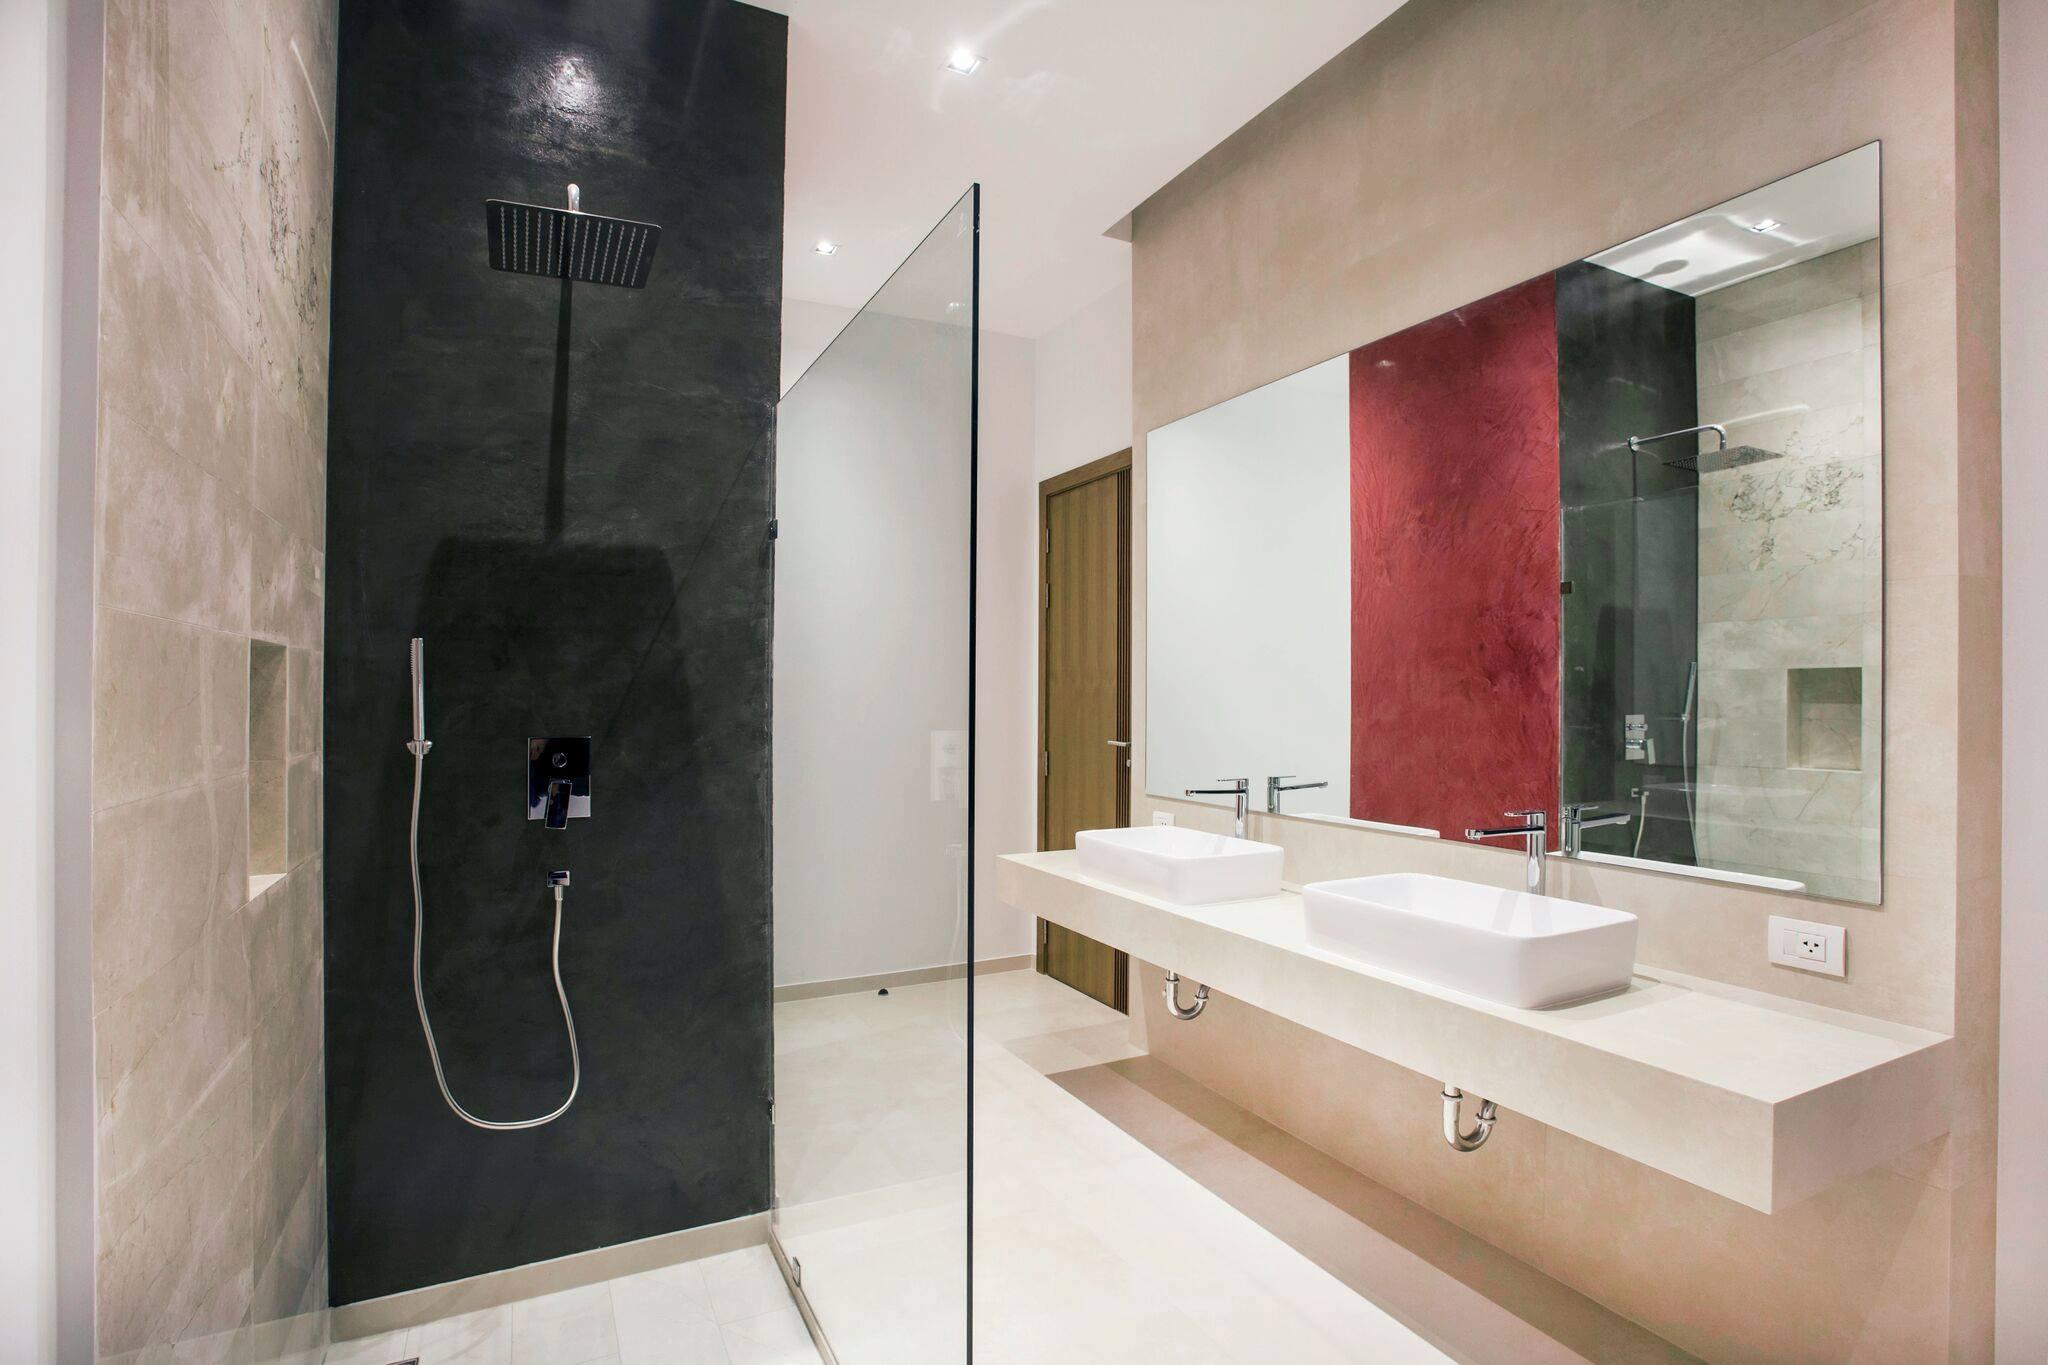 Phuket Real Estate Agency – Nai Harn Beach (34)